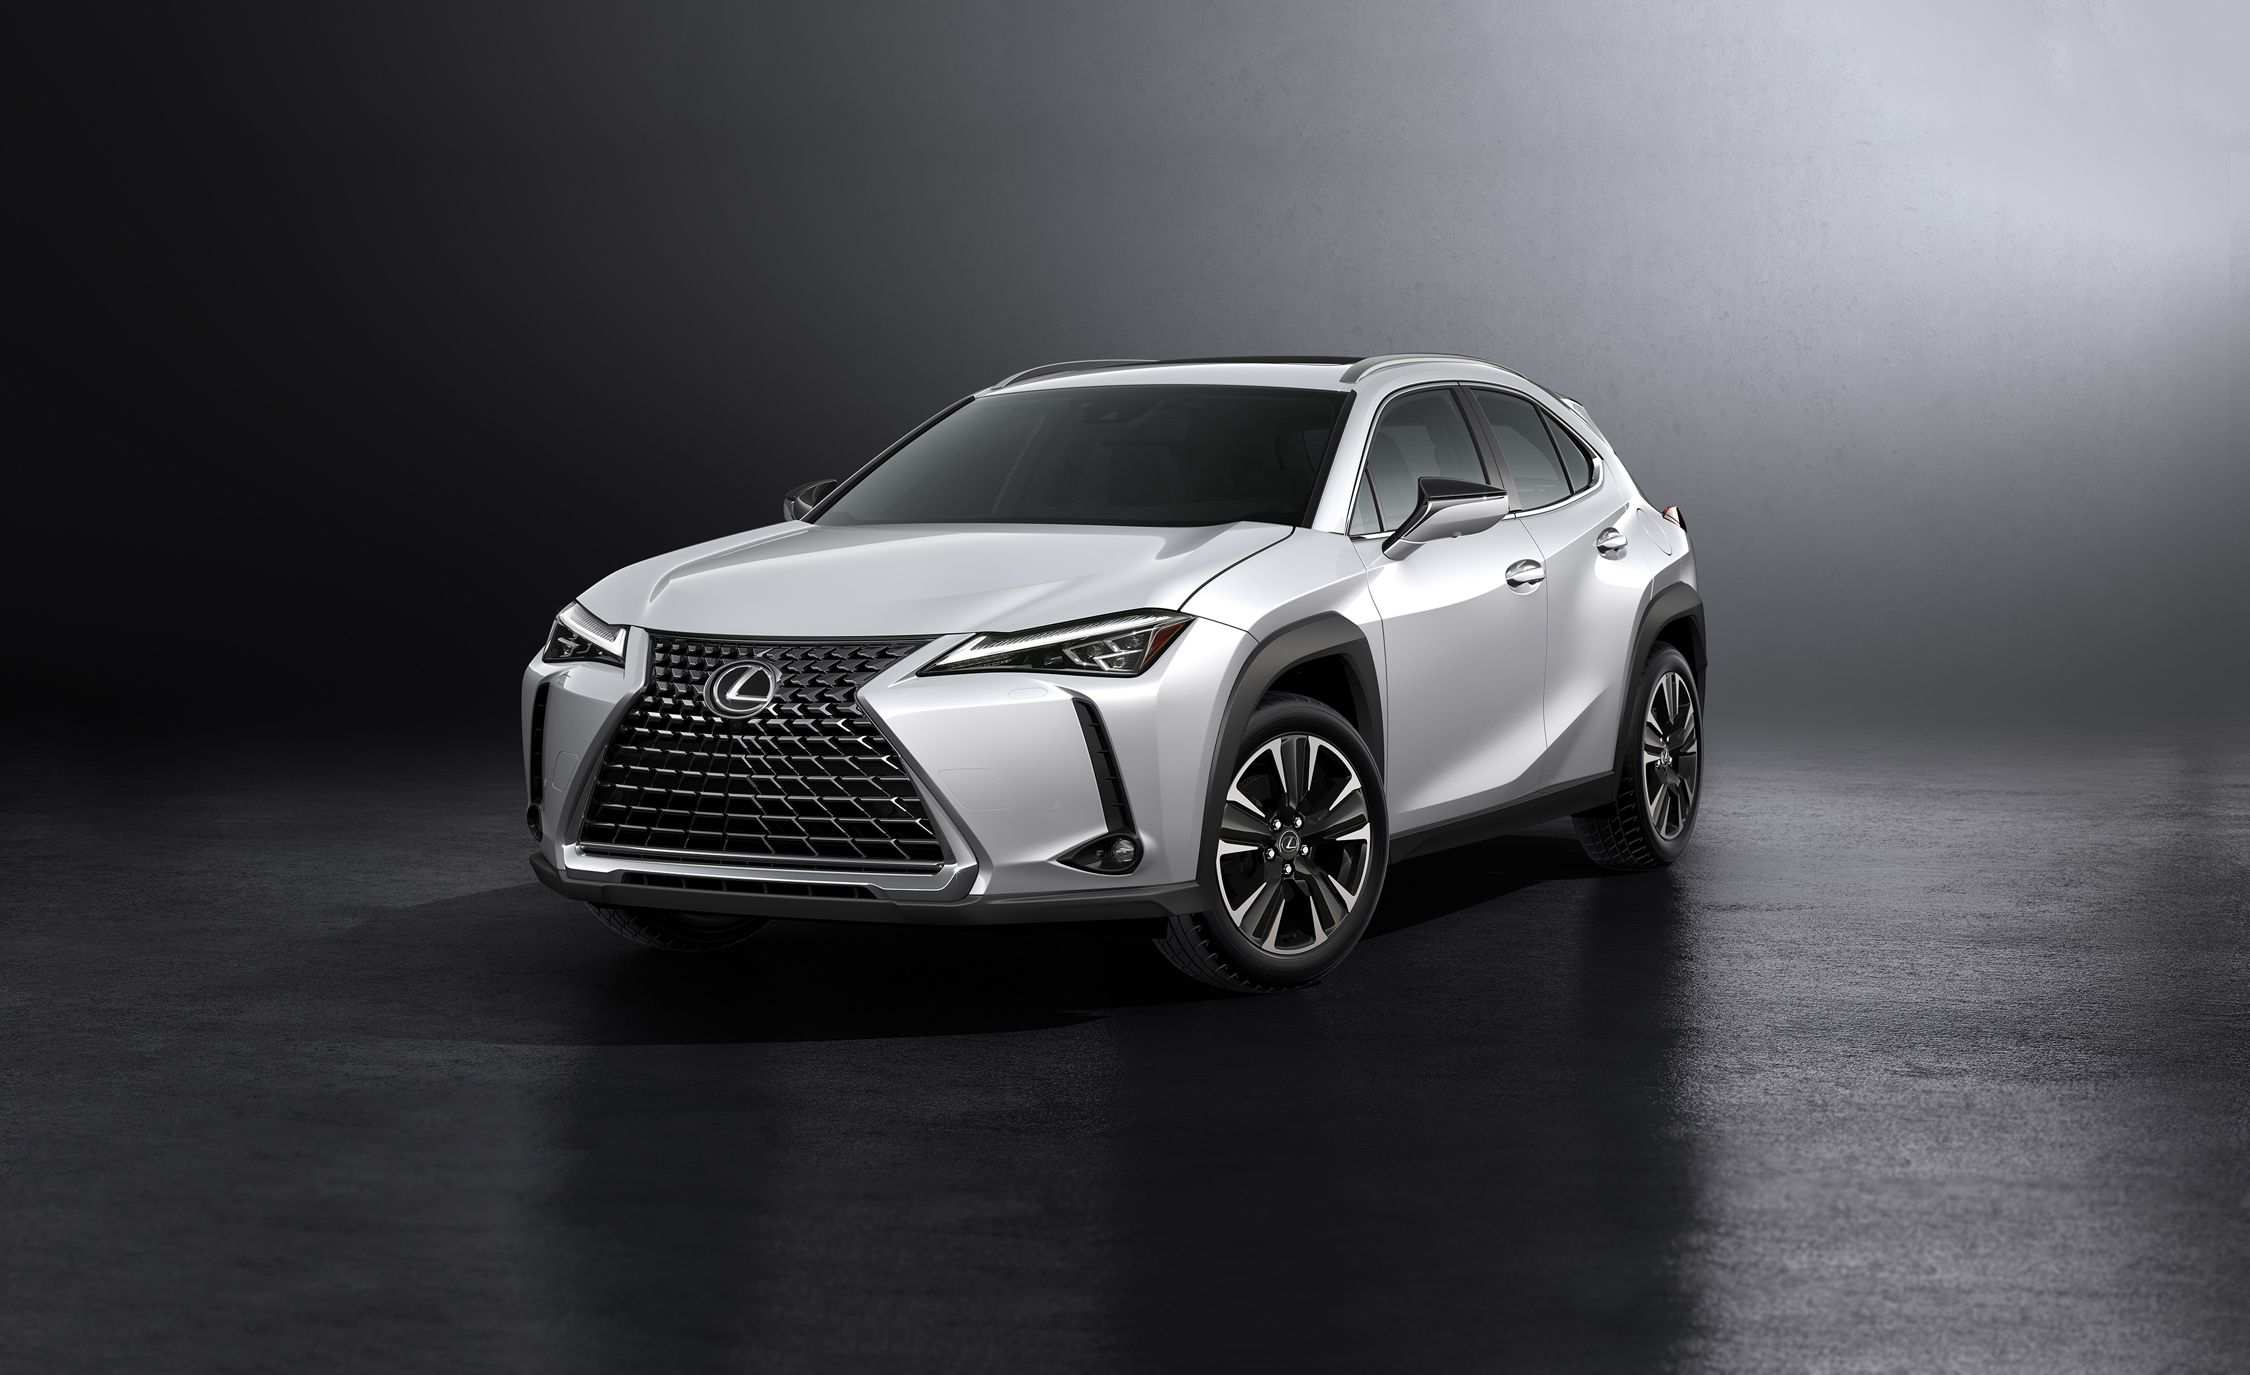 73 Best Review Lexus Ux 2020 New Concept Release with Lexus Ux 2020 New Concept